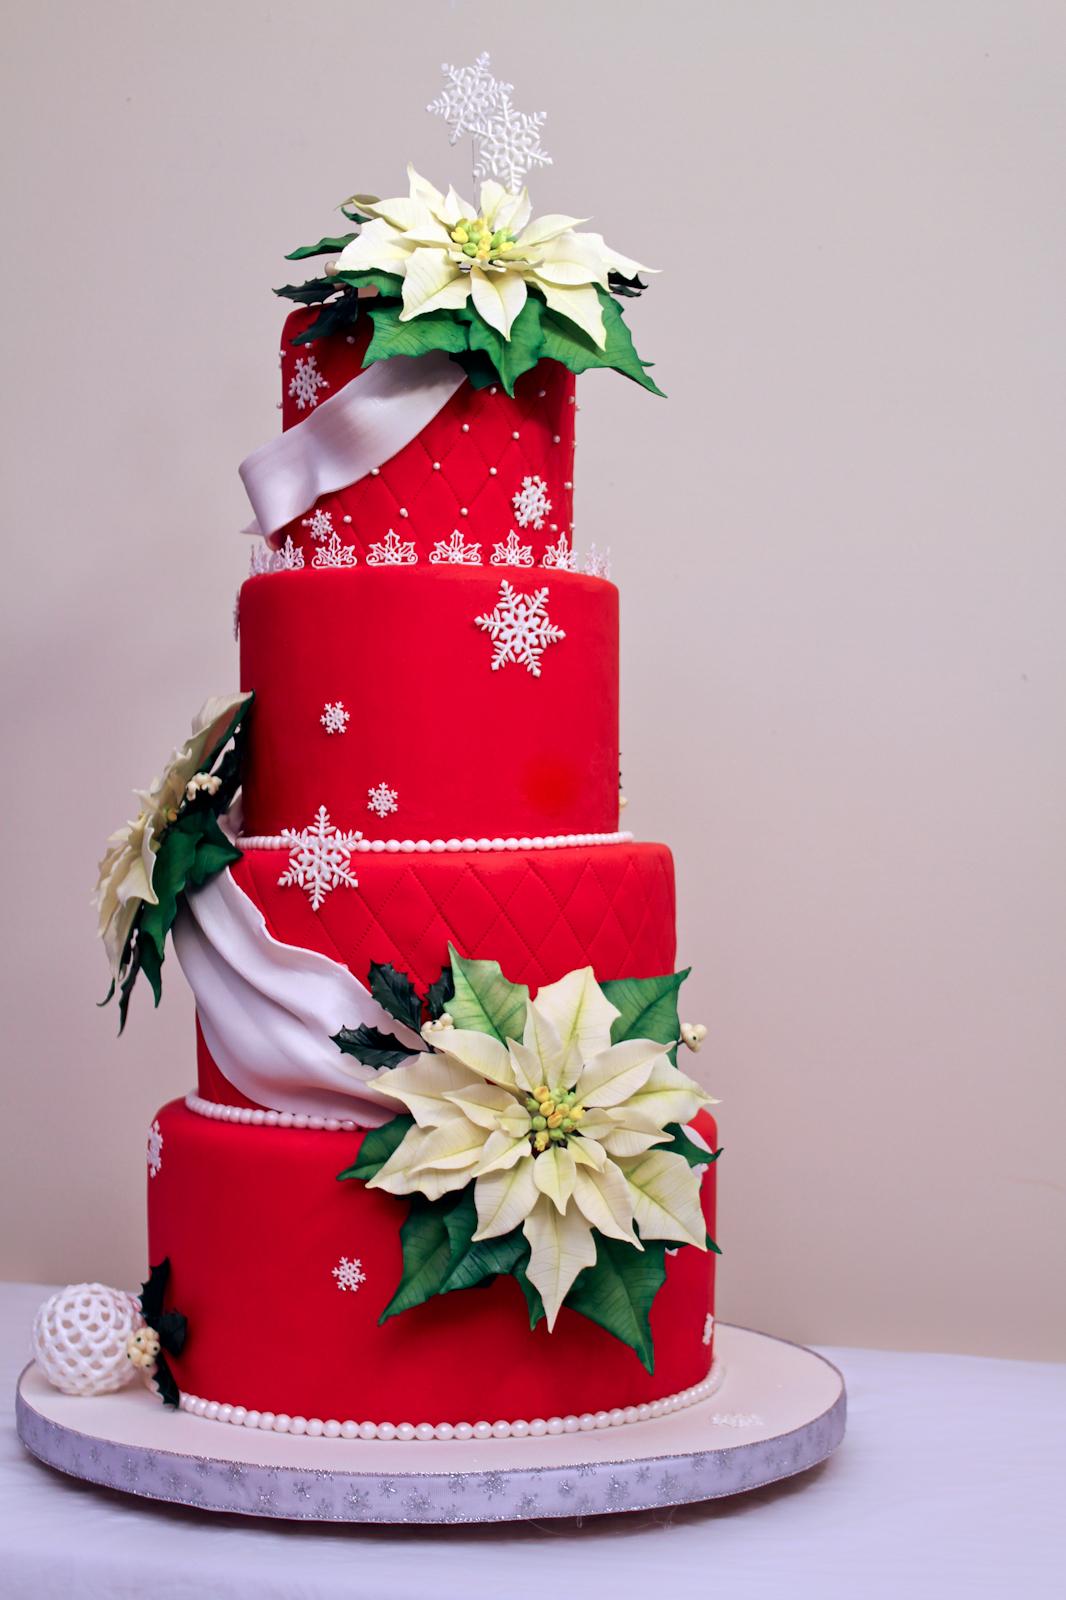 The Cake Engineer Holiday Poinsettia Cake